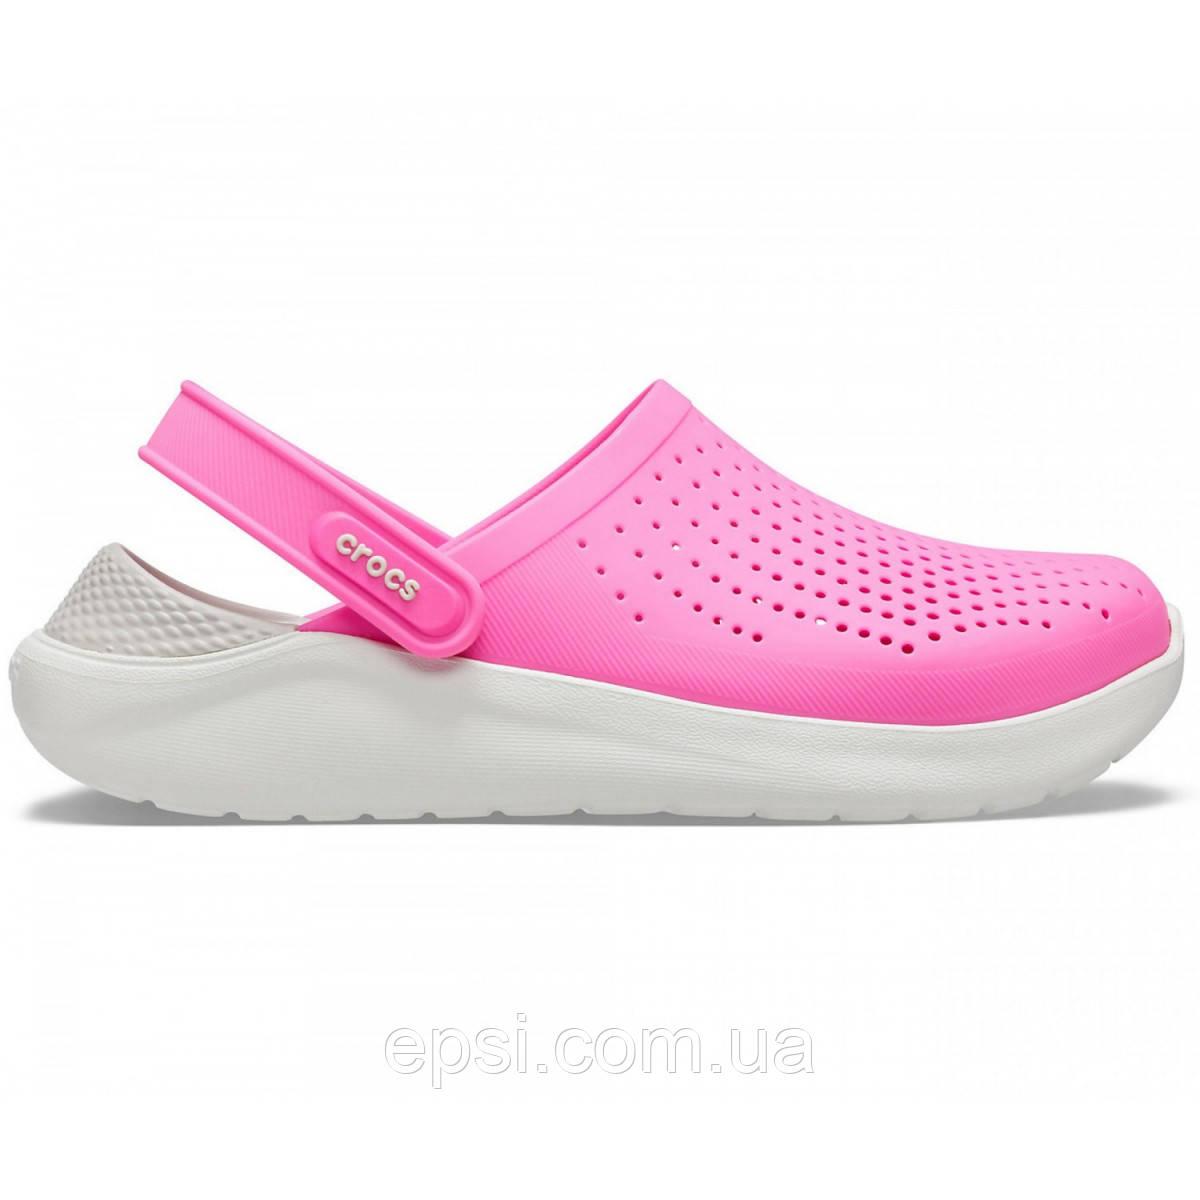 Сабо Crocs  LiteRide Clog  / Electric Pink(  Розовый  )  M5W7   37